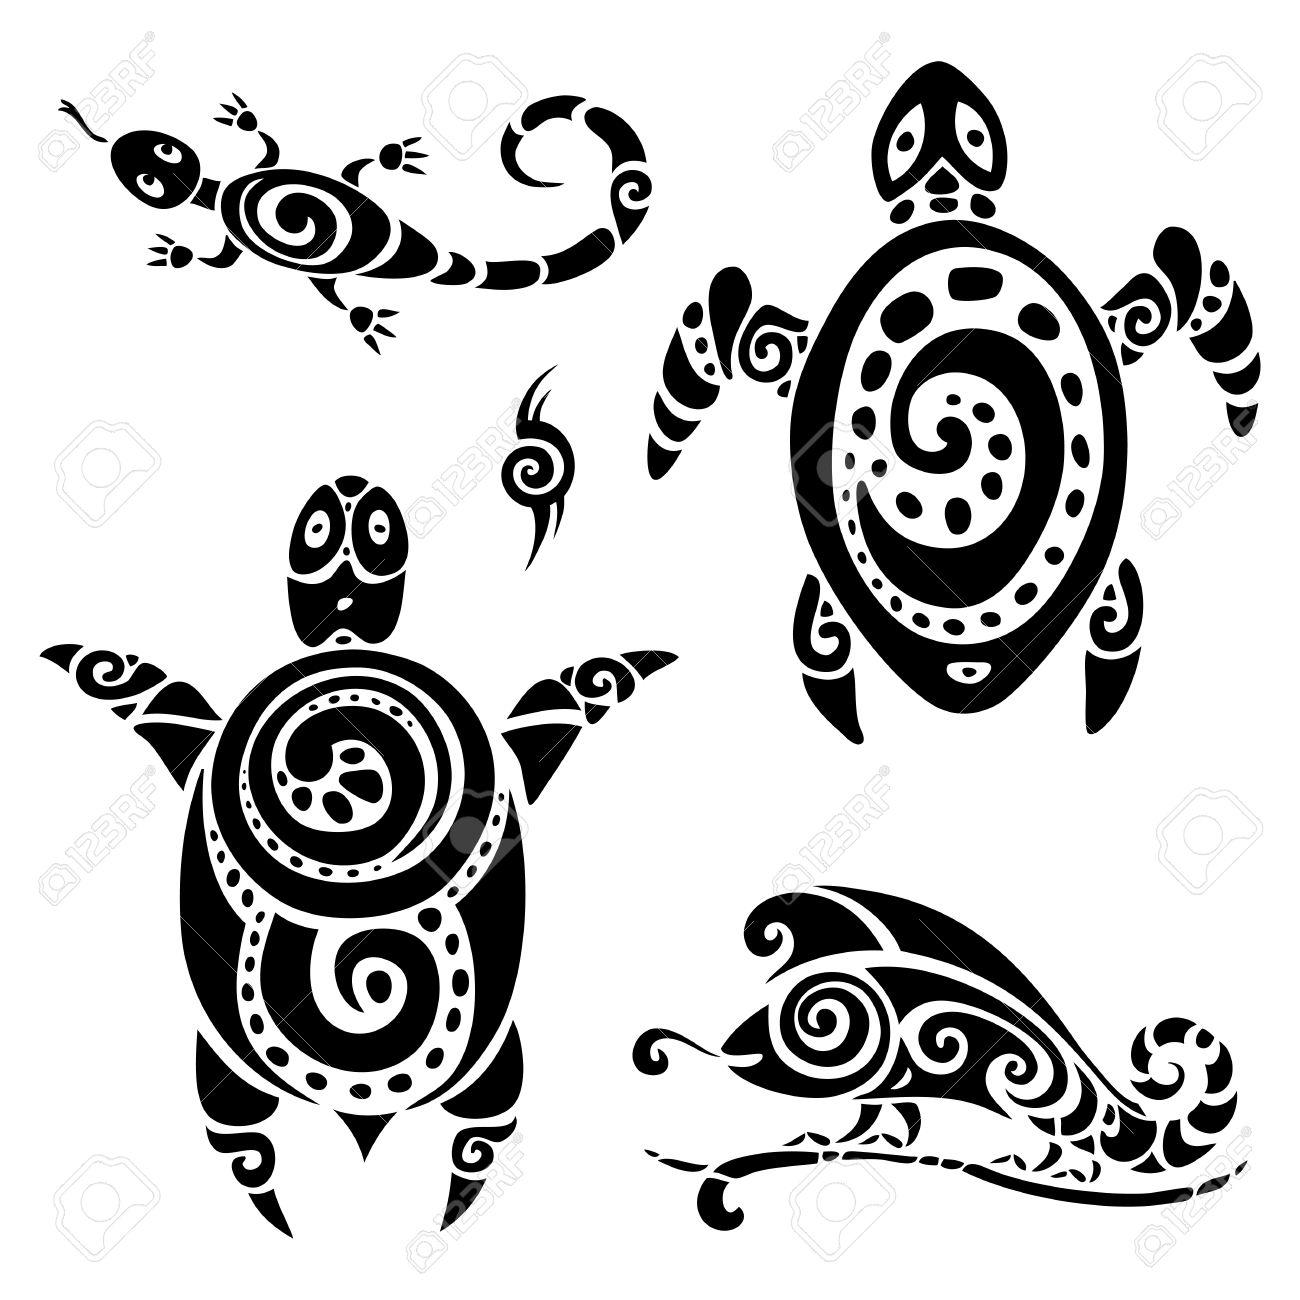 Turtle Polynesian Tattoo Tribal Pattern Set Vector Illustration